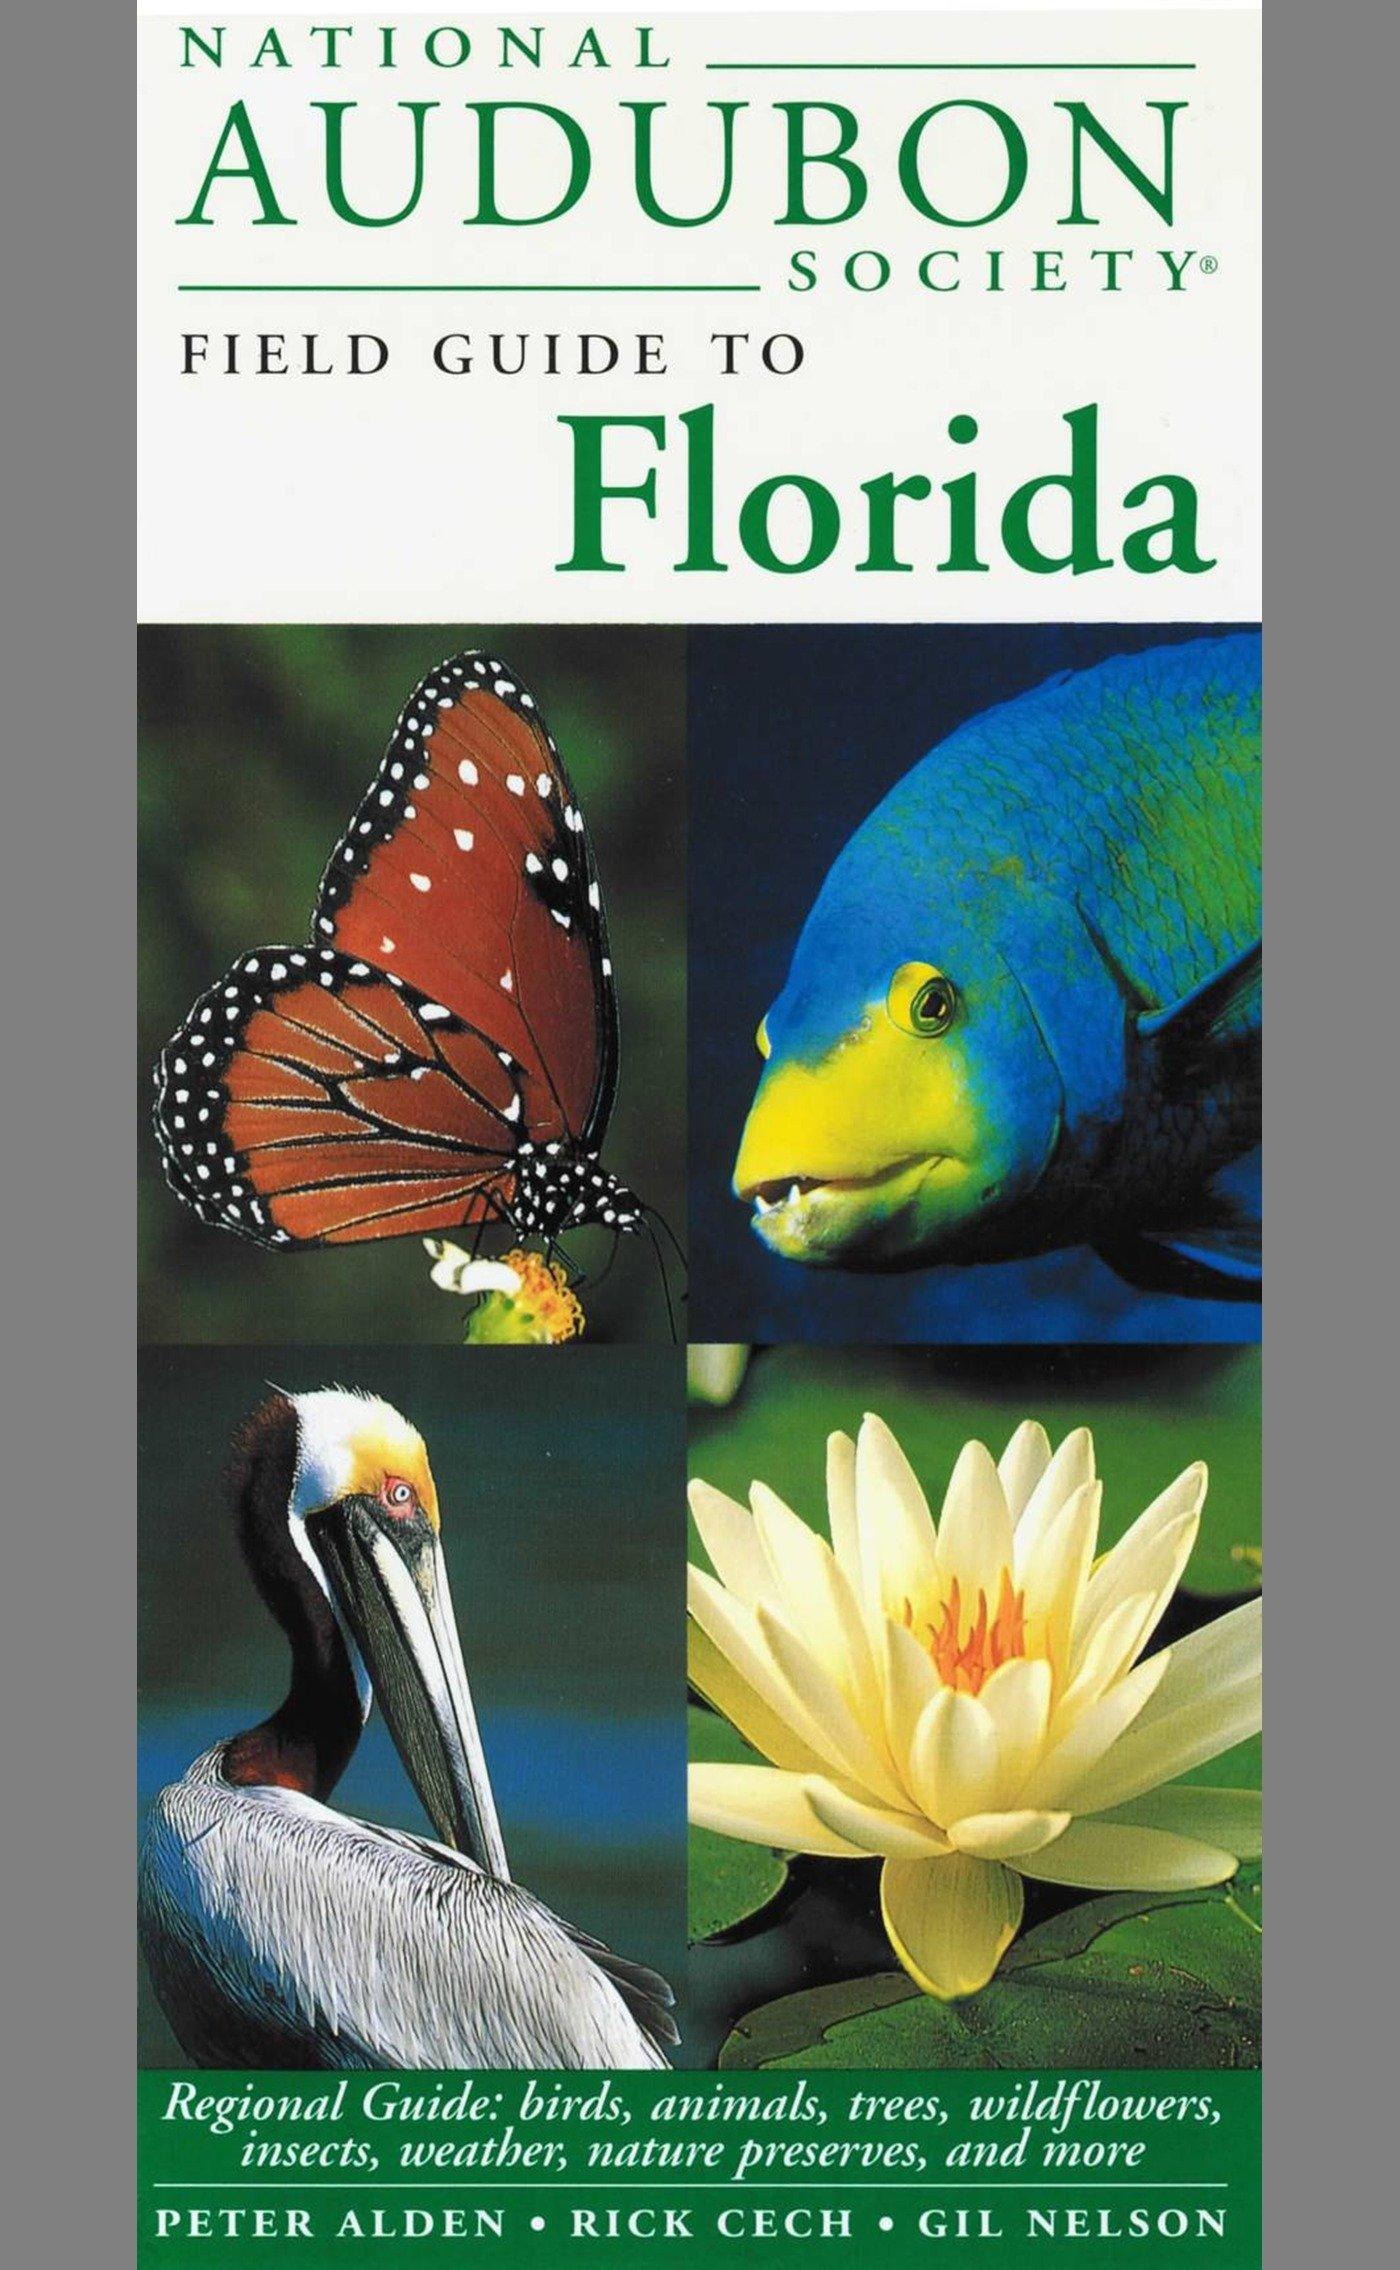 National Audubon Society Field Guide to Florida: National Audubon Society,  Peter Alden, Rick Cech: 9780679446774: Amazon.com: Books